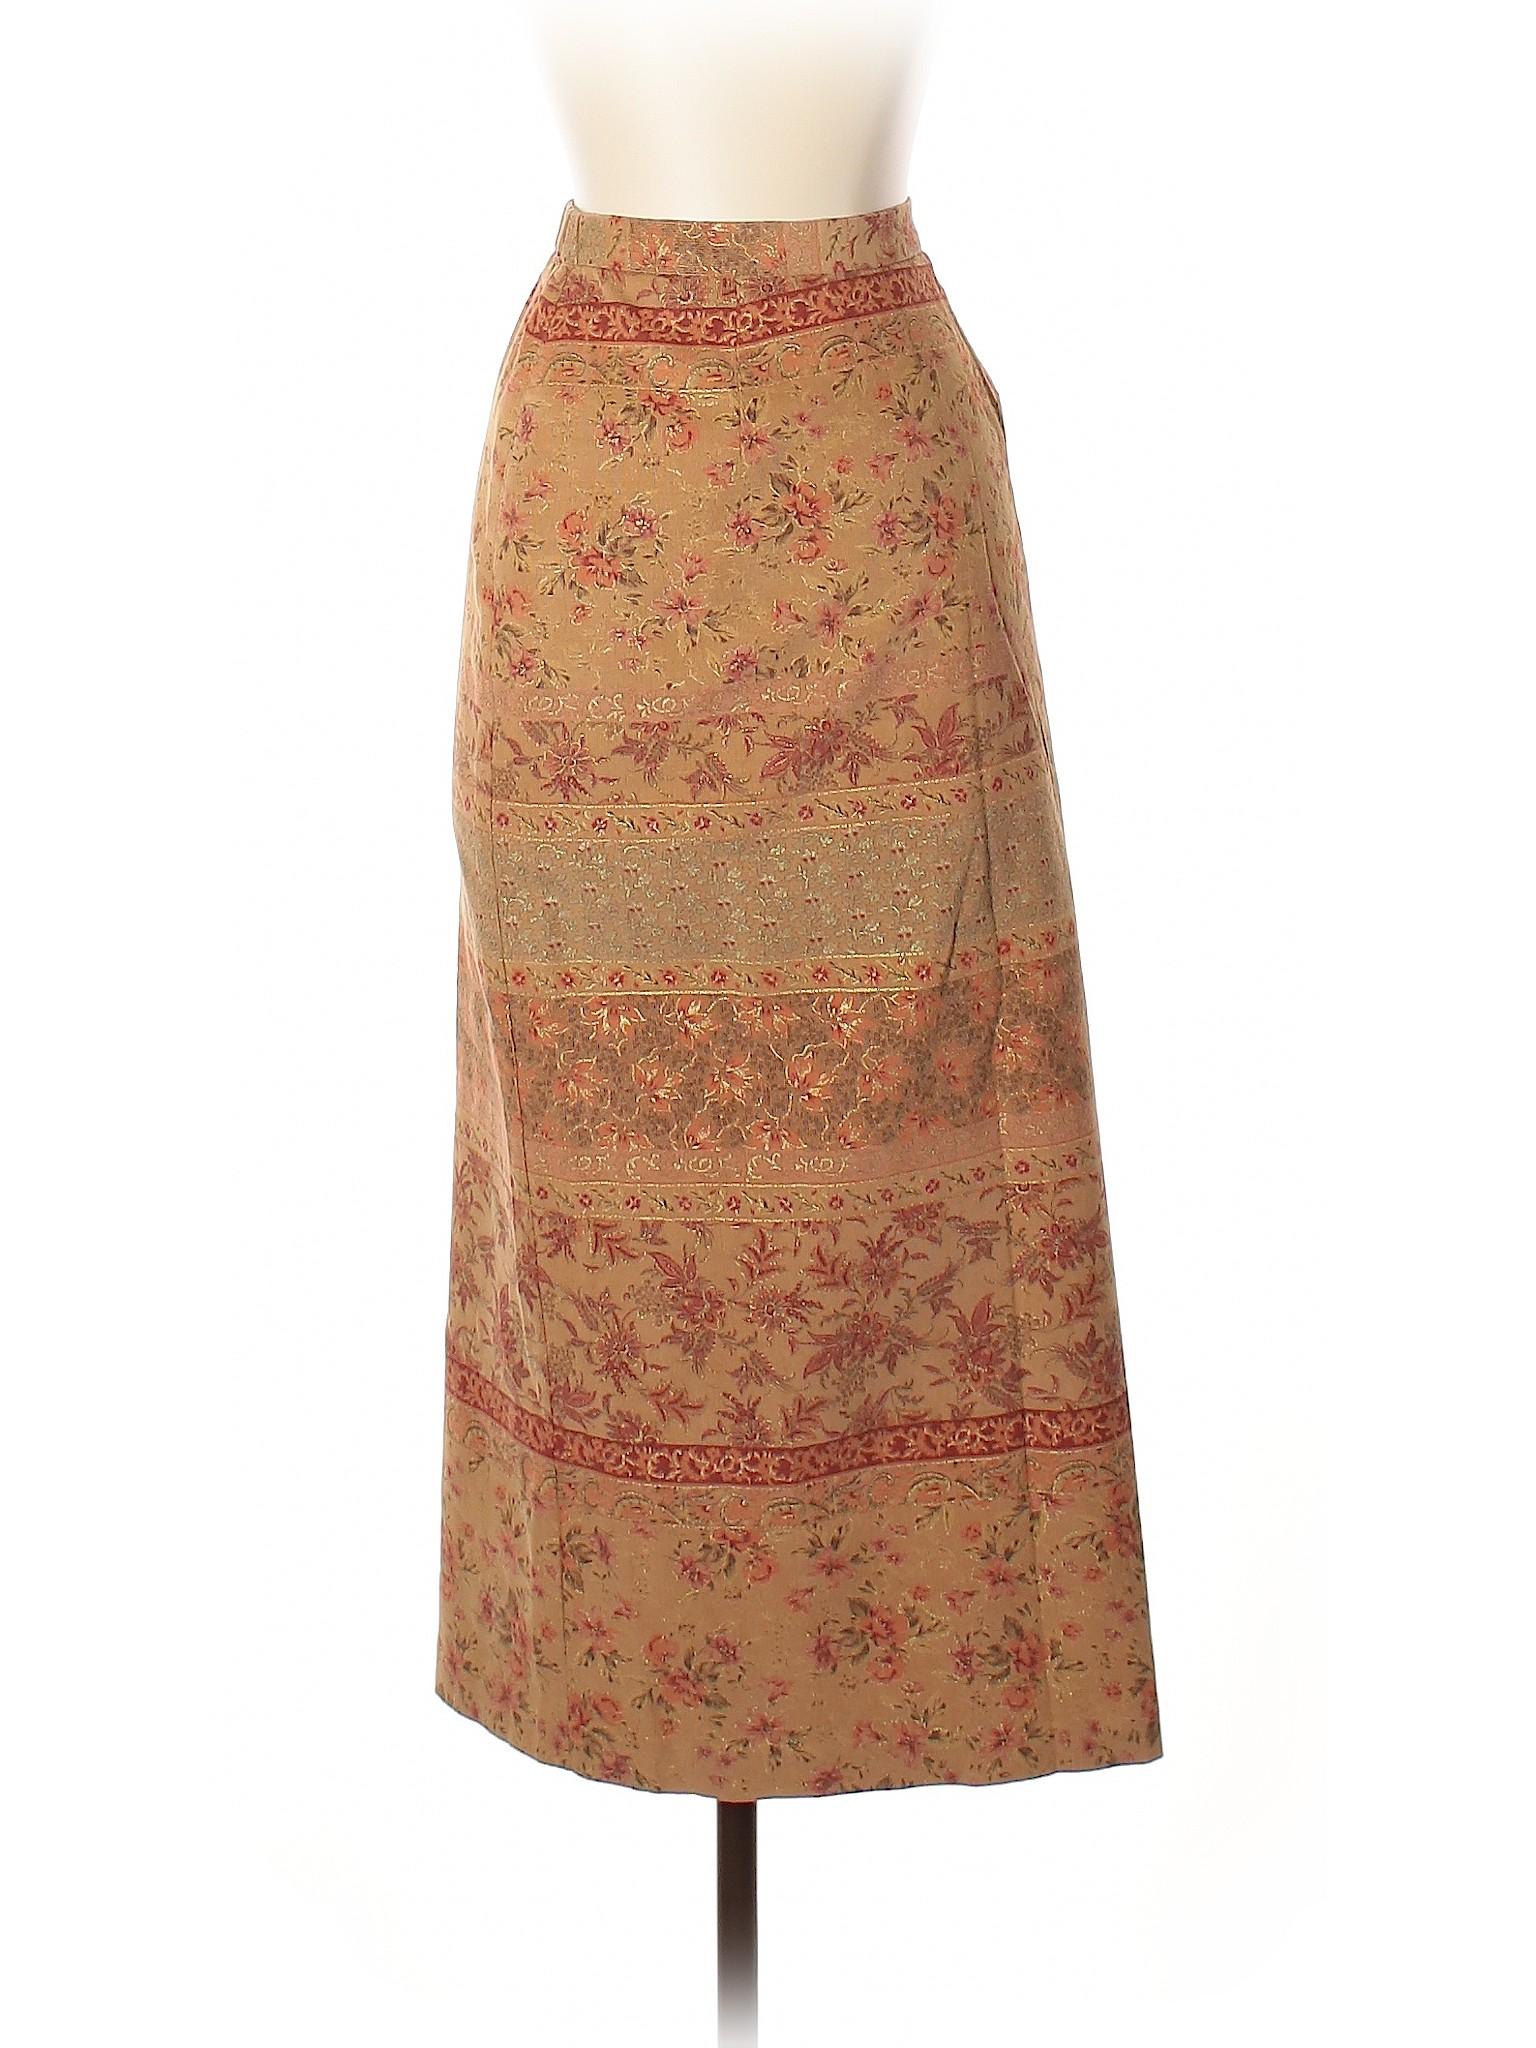 Boutique Casual Skirt Skirt Boutique Casual Boutique rRBqxwrTp